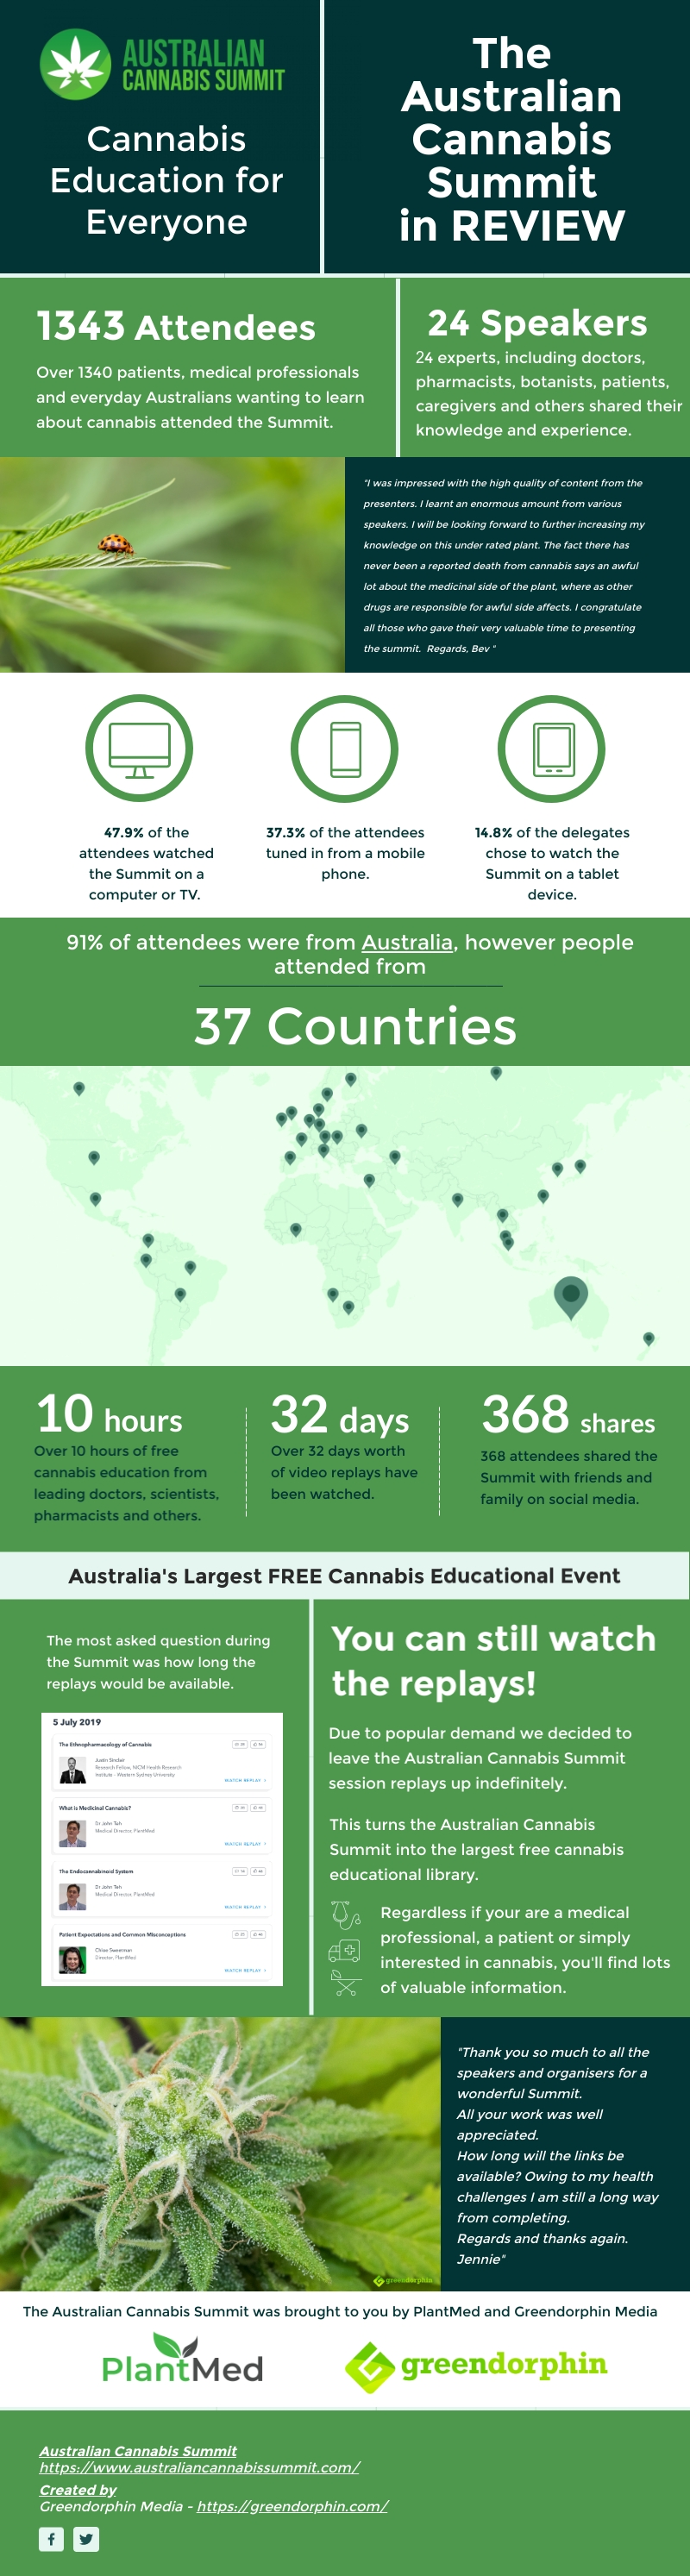 Australian Cannabis Summit in Review